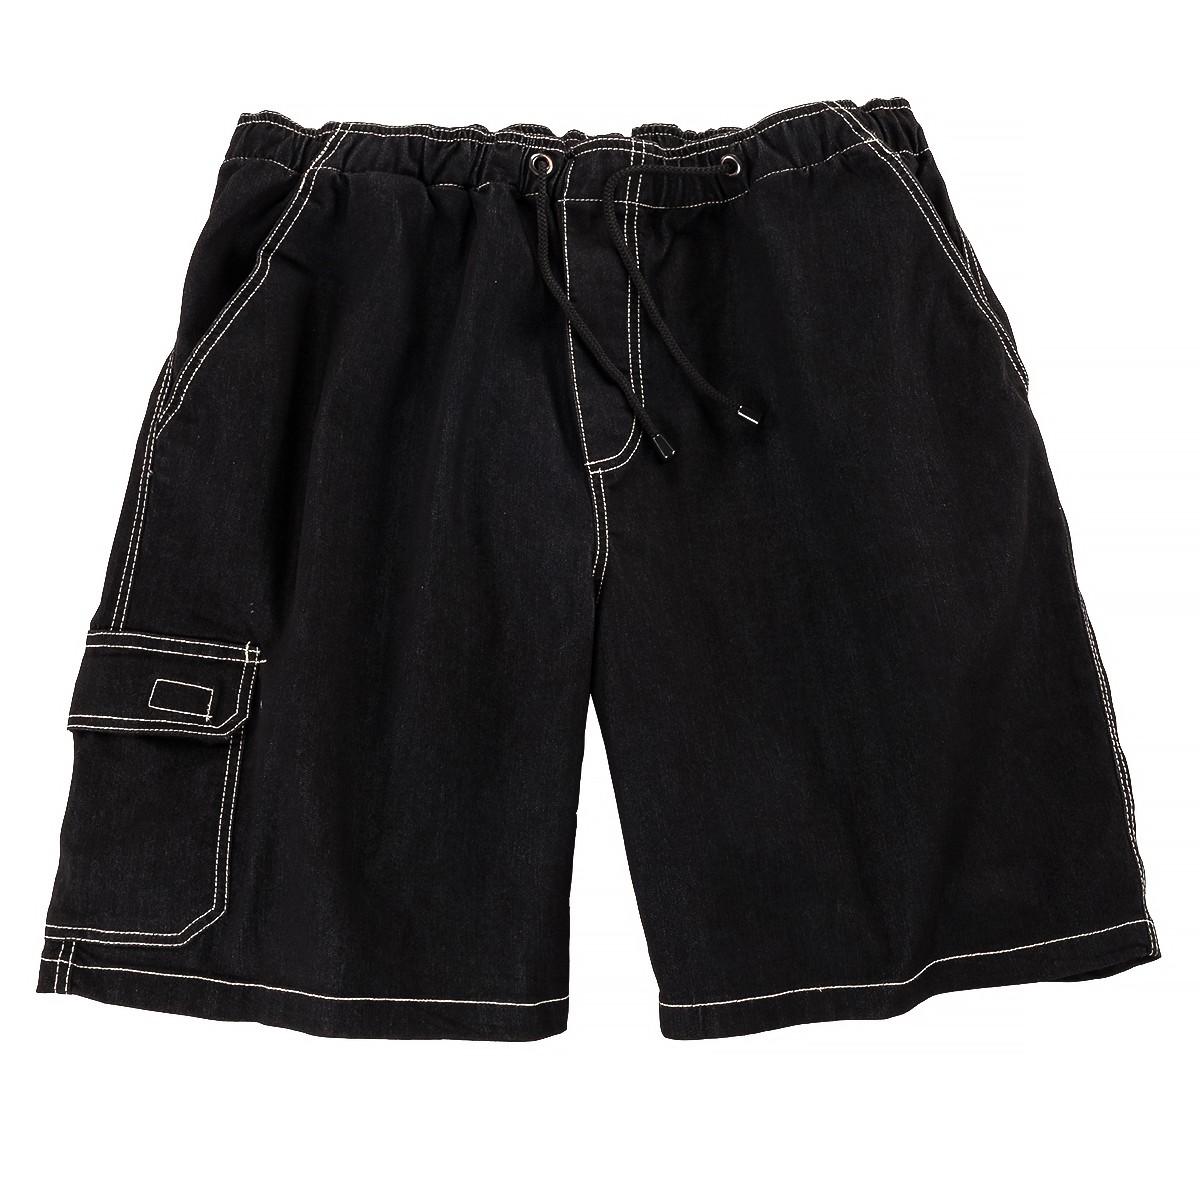 abraxas schwarze jeans bermuda mit gummibund bergr e. Black Bedroom Furniture Sets. Home Design Ideas